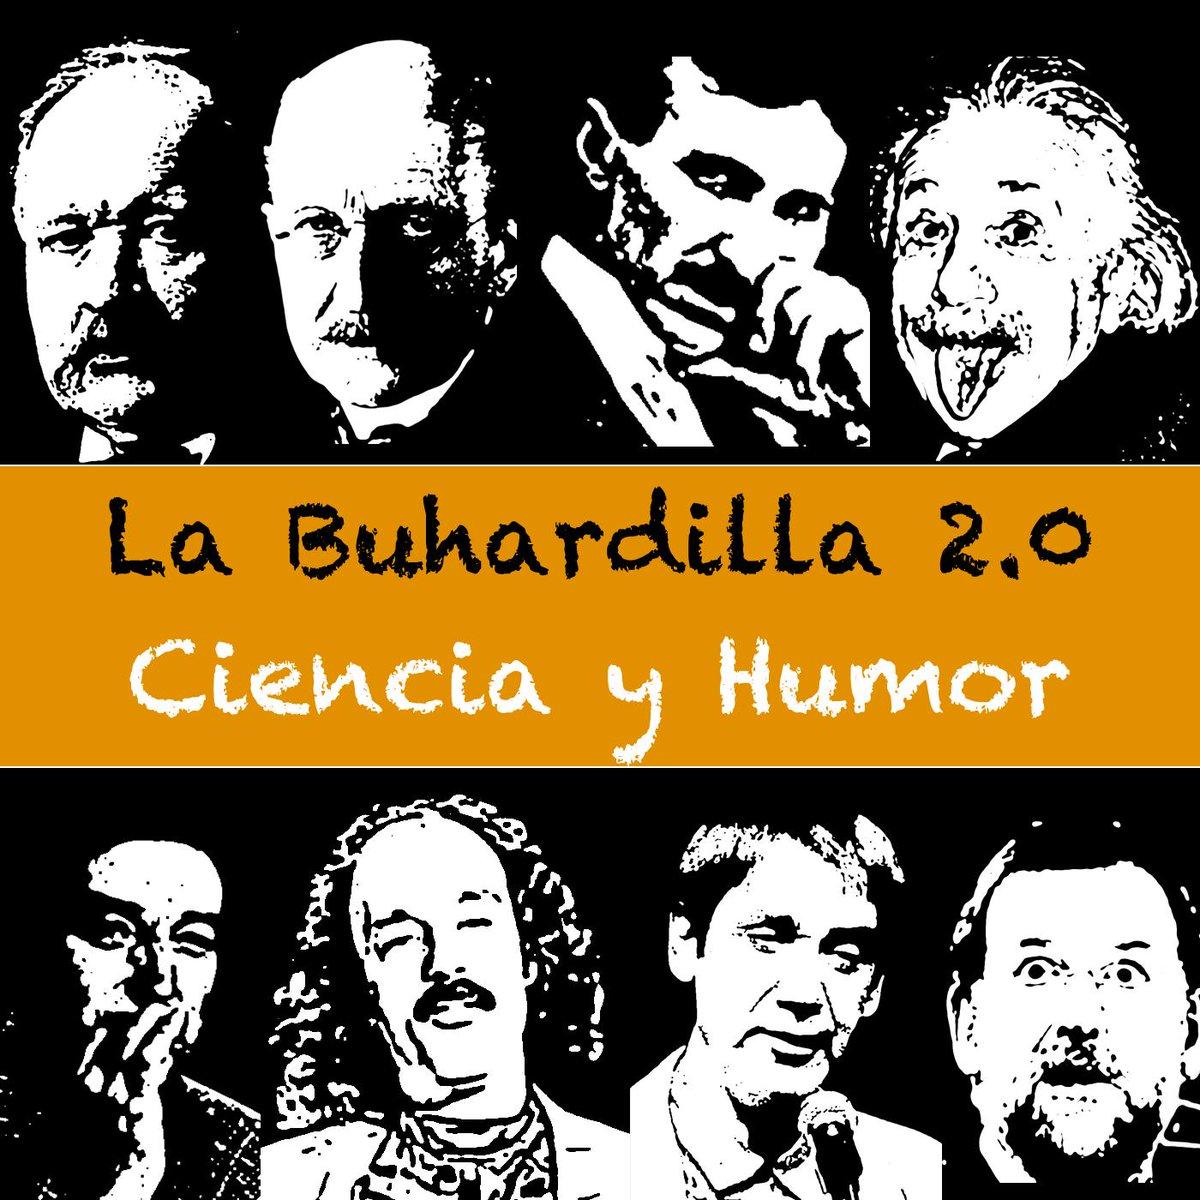 La Buhardilla 2.0 Pograma 165: Jane Marcet y #WomenInSTEM, de La Buhardilla 2.0 https://t.co/v0yb9Aot3I